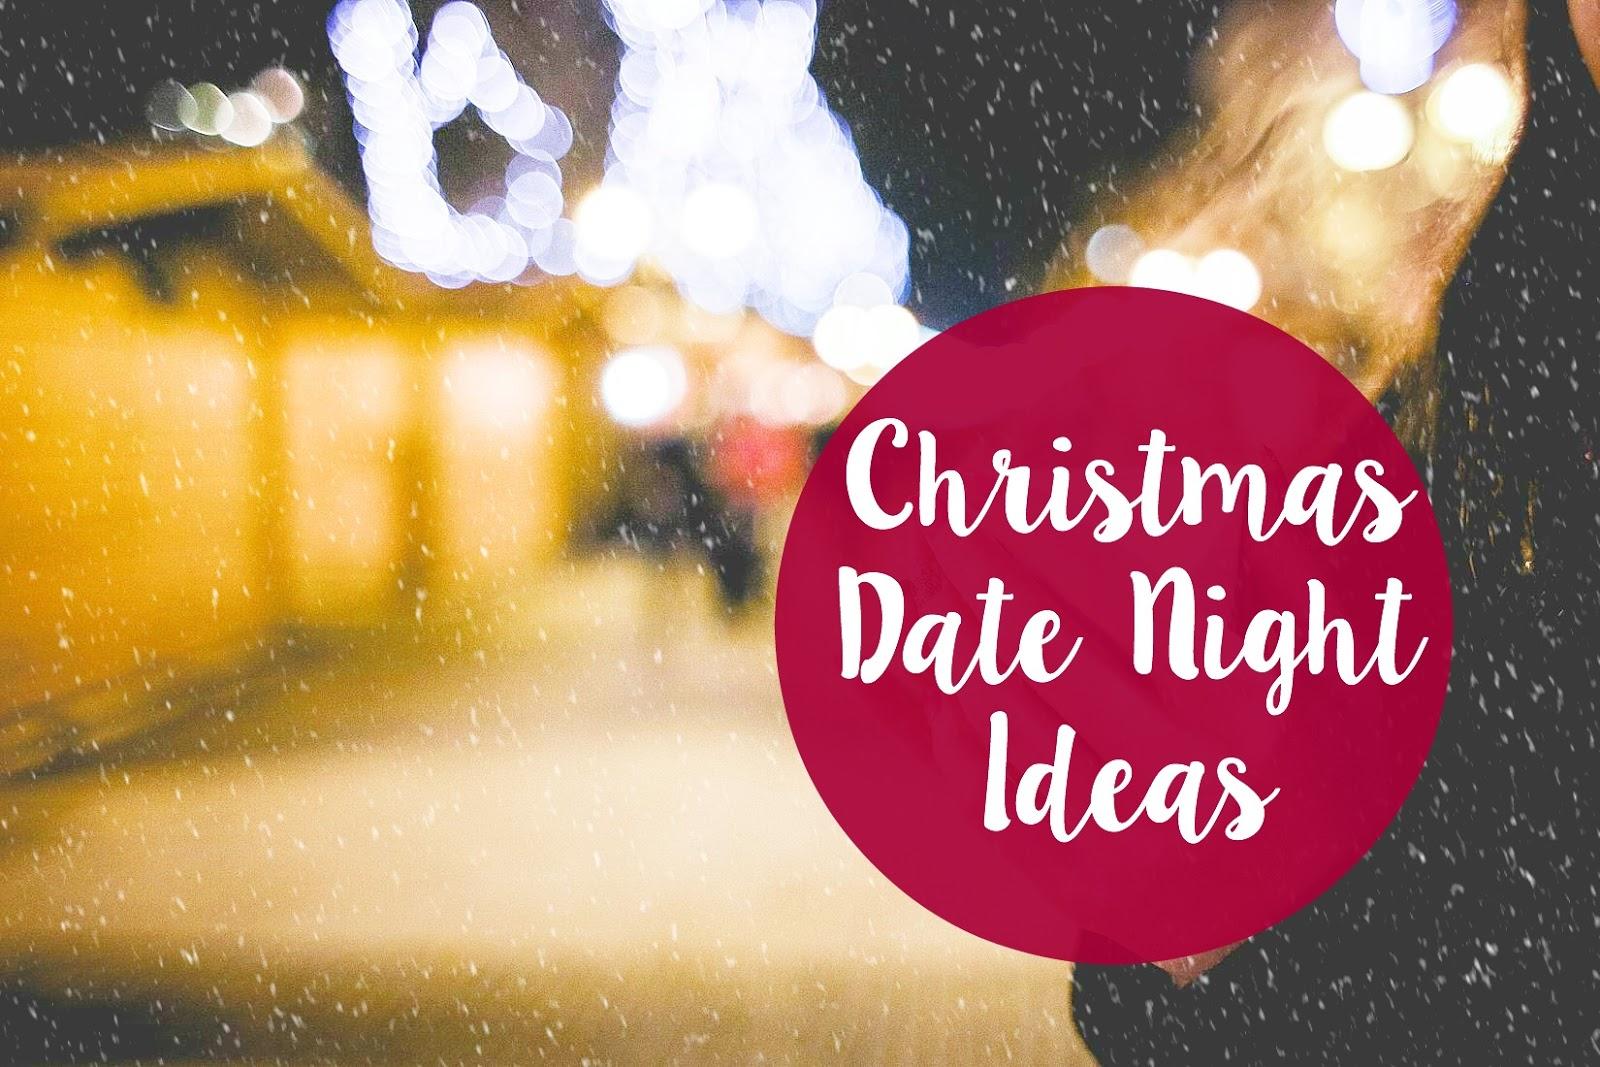 Lifestyle, Christmas, Christmas date night ideas, love, winter, winter date night ideas, winter wonderland,